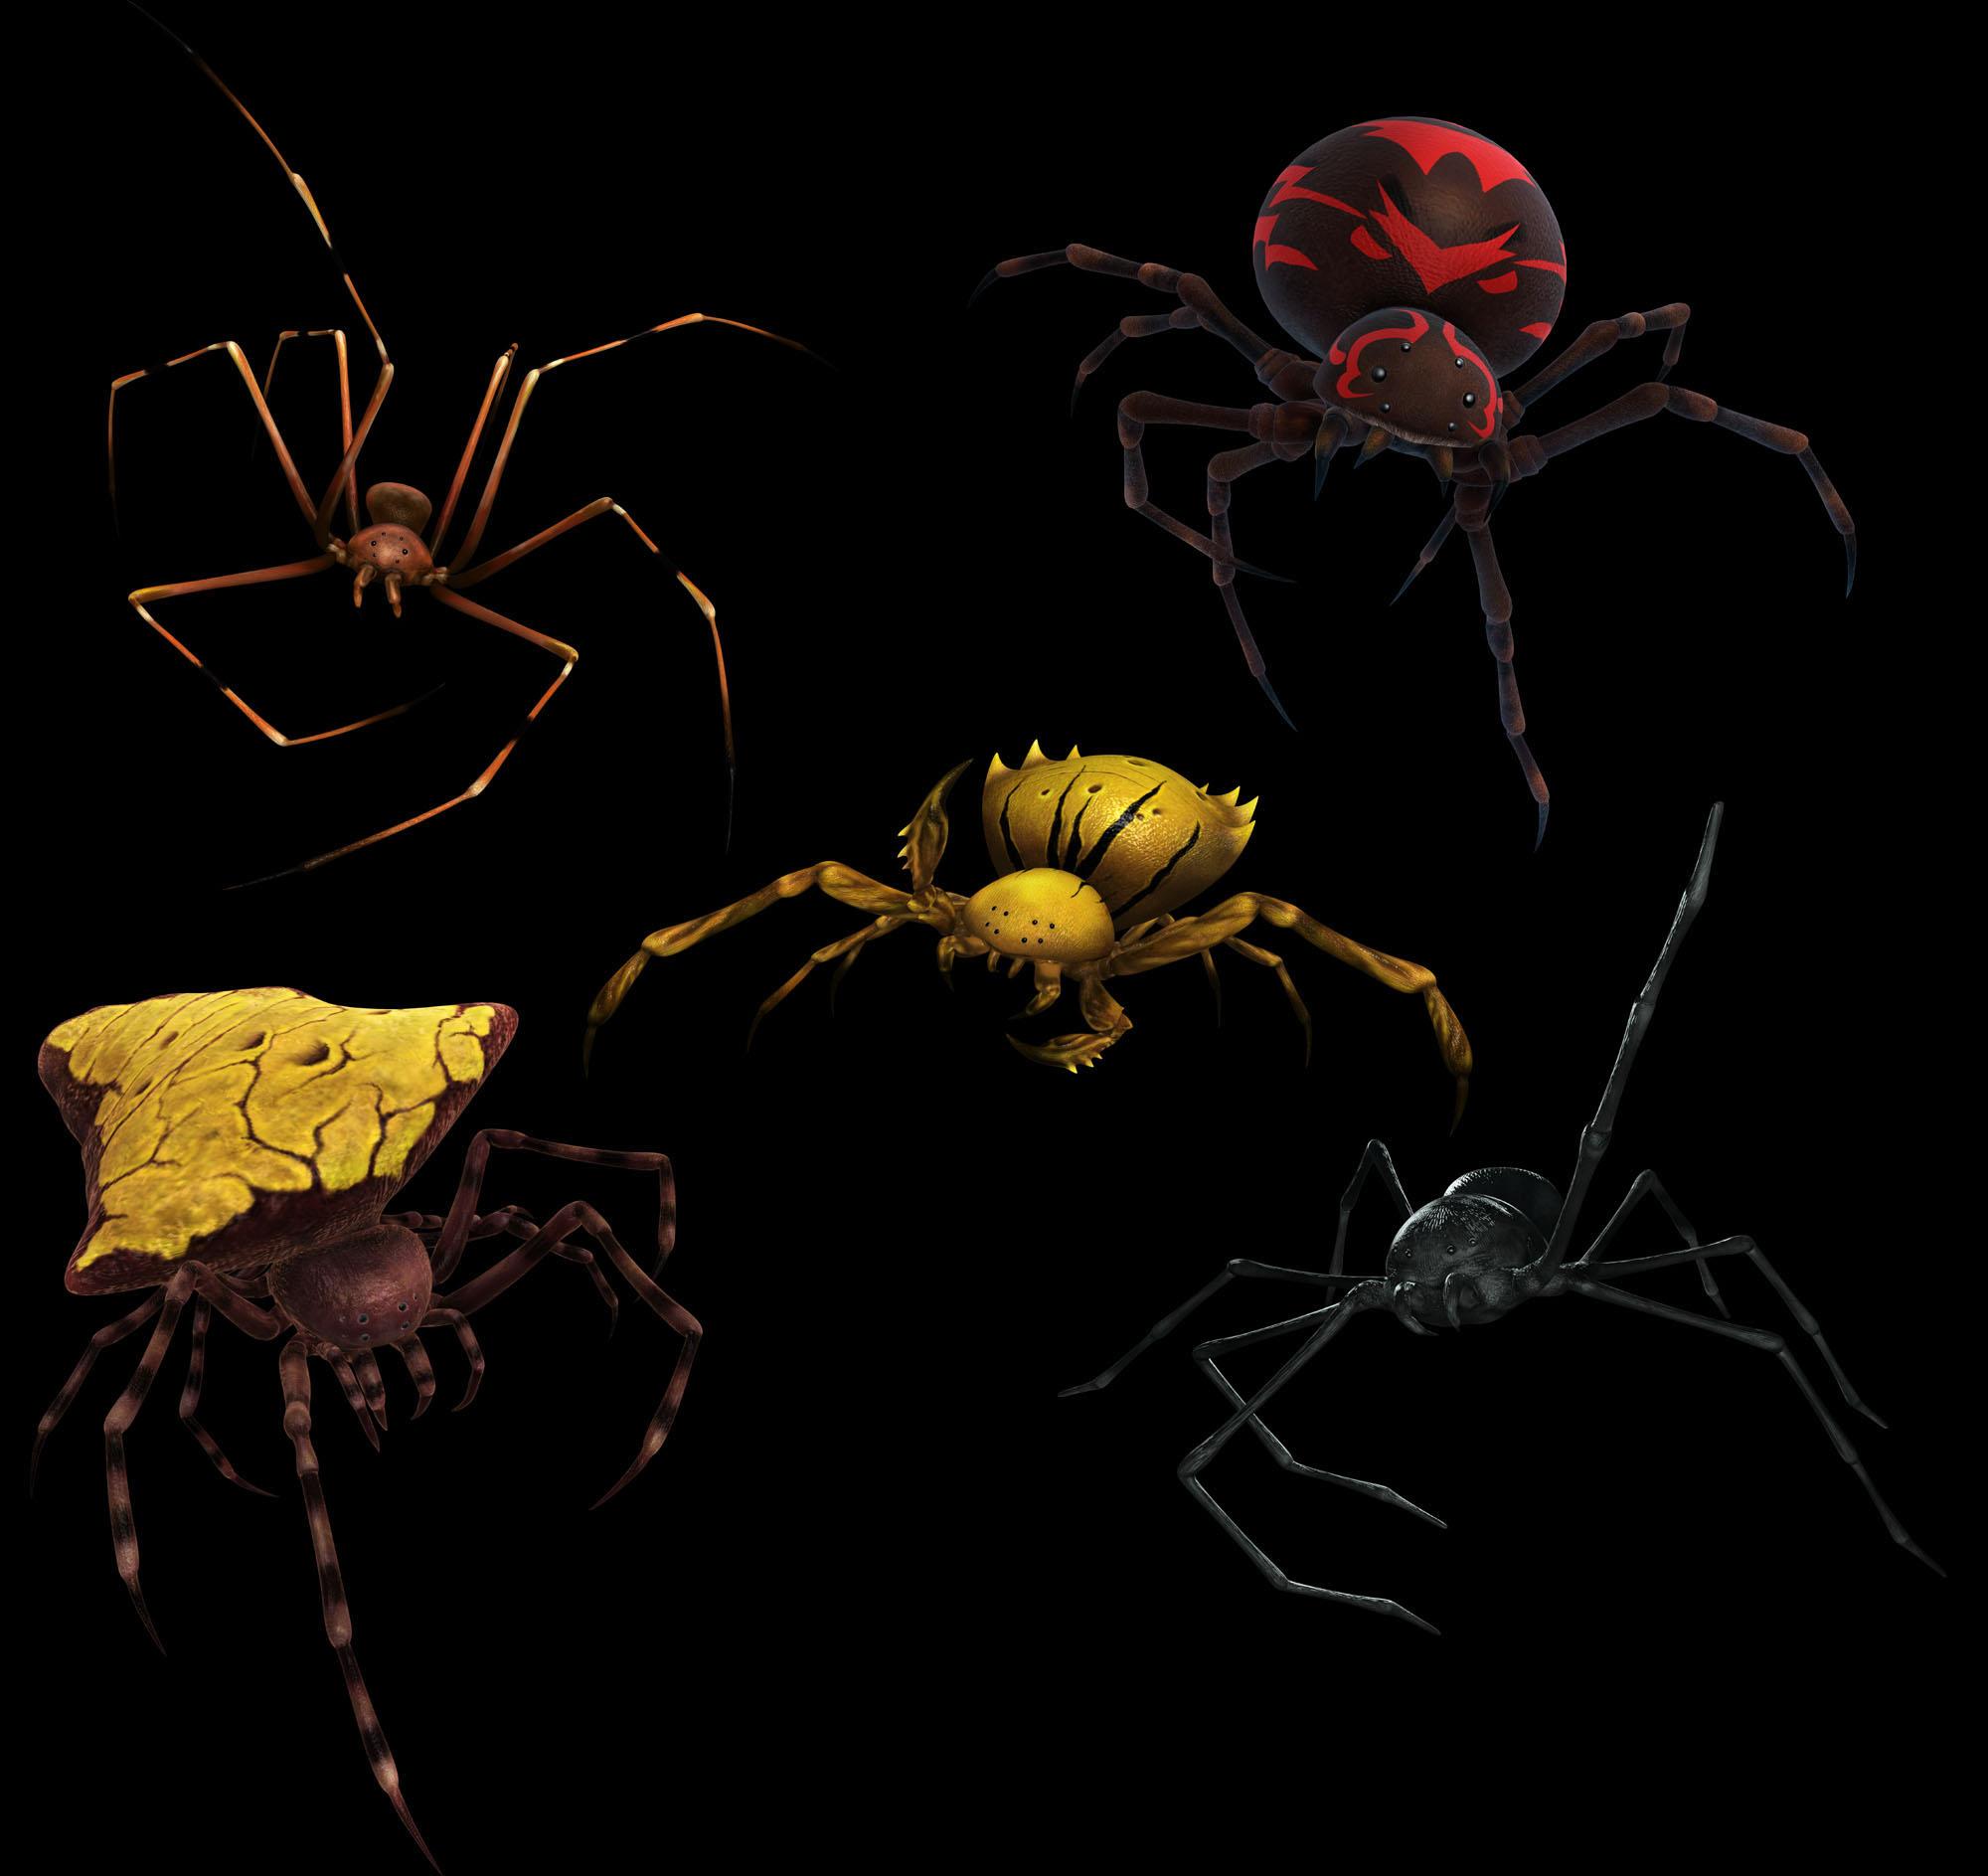 crab_widow_poster_v001.jpg